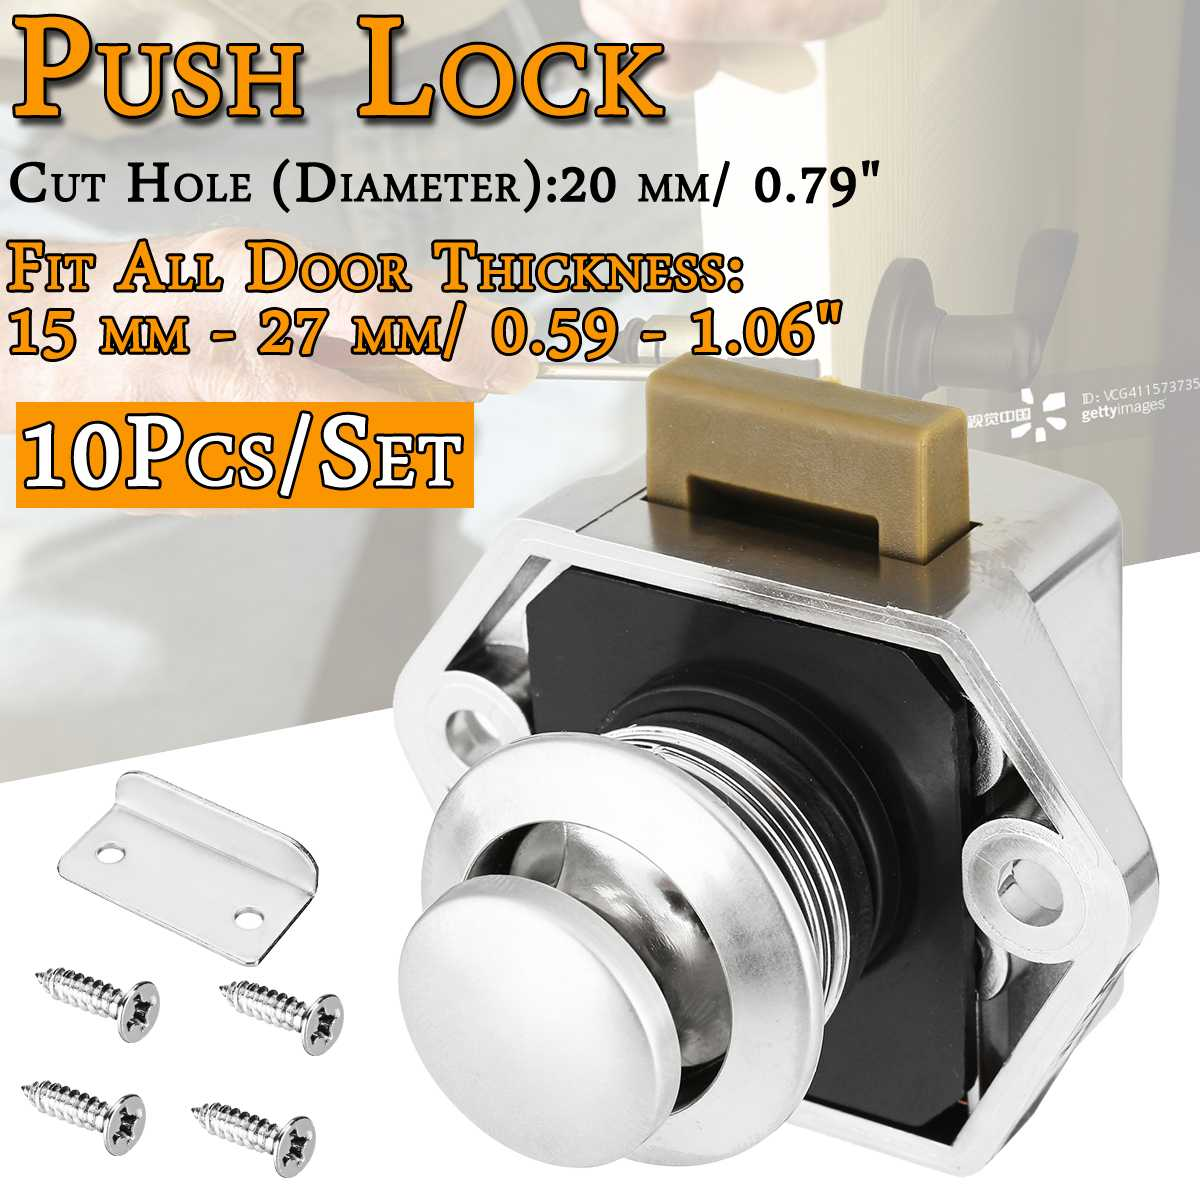 10pcs Car Push Lock Diameter 20mm RV Caravan Boat Motor Home Cabinet Drawer Latch Button Locks For Furniture Hardware